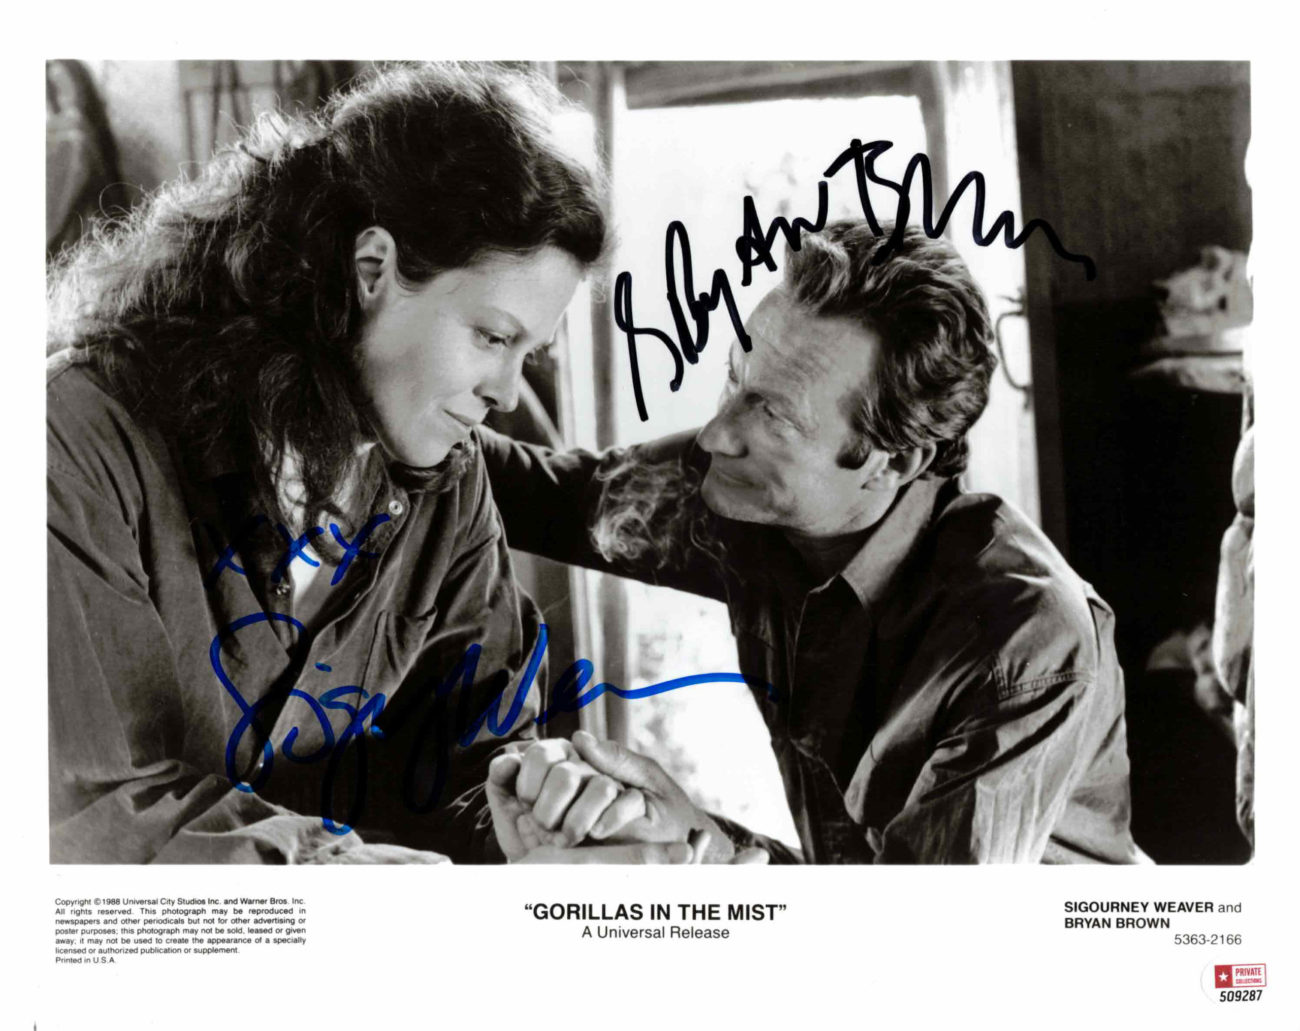 Sigourney Weaver & Bryan Brown - autogram